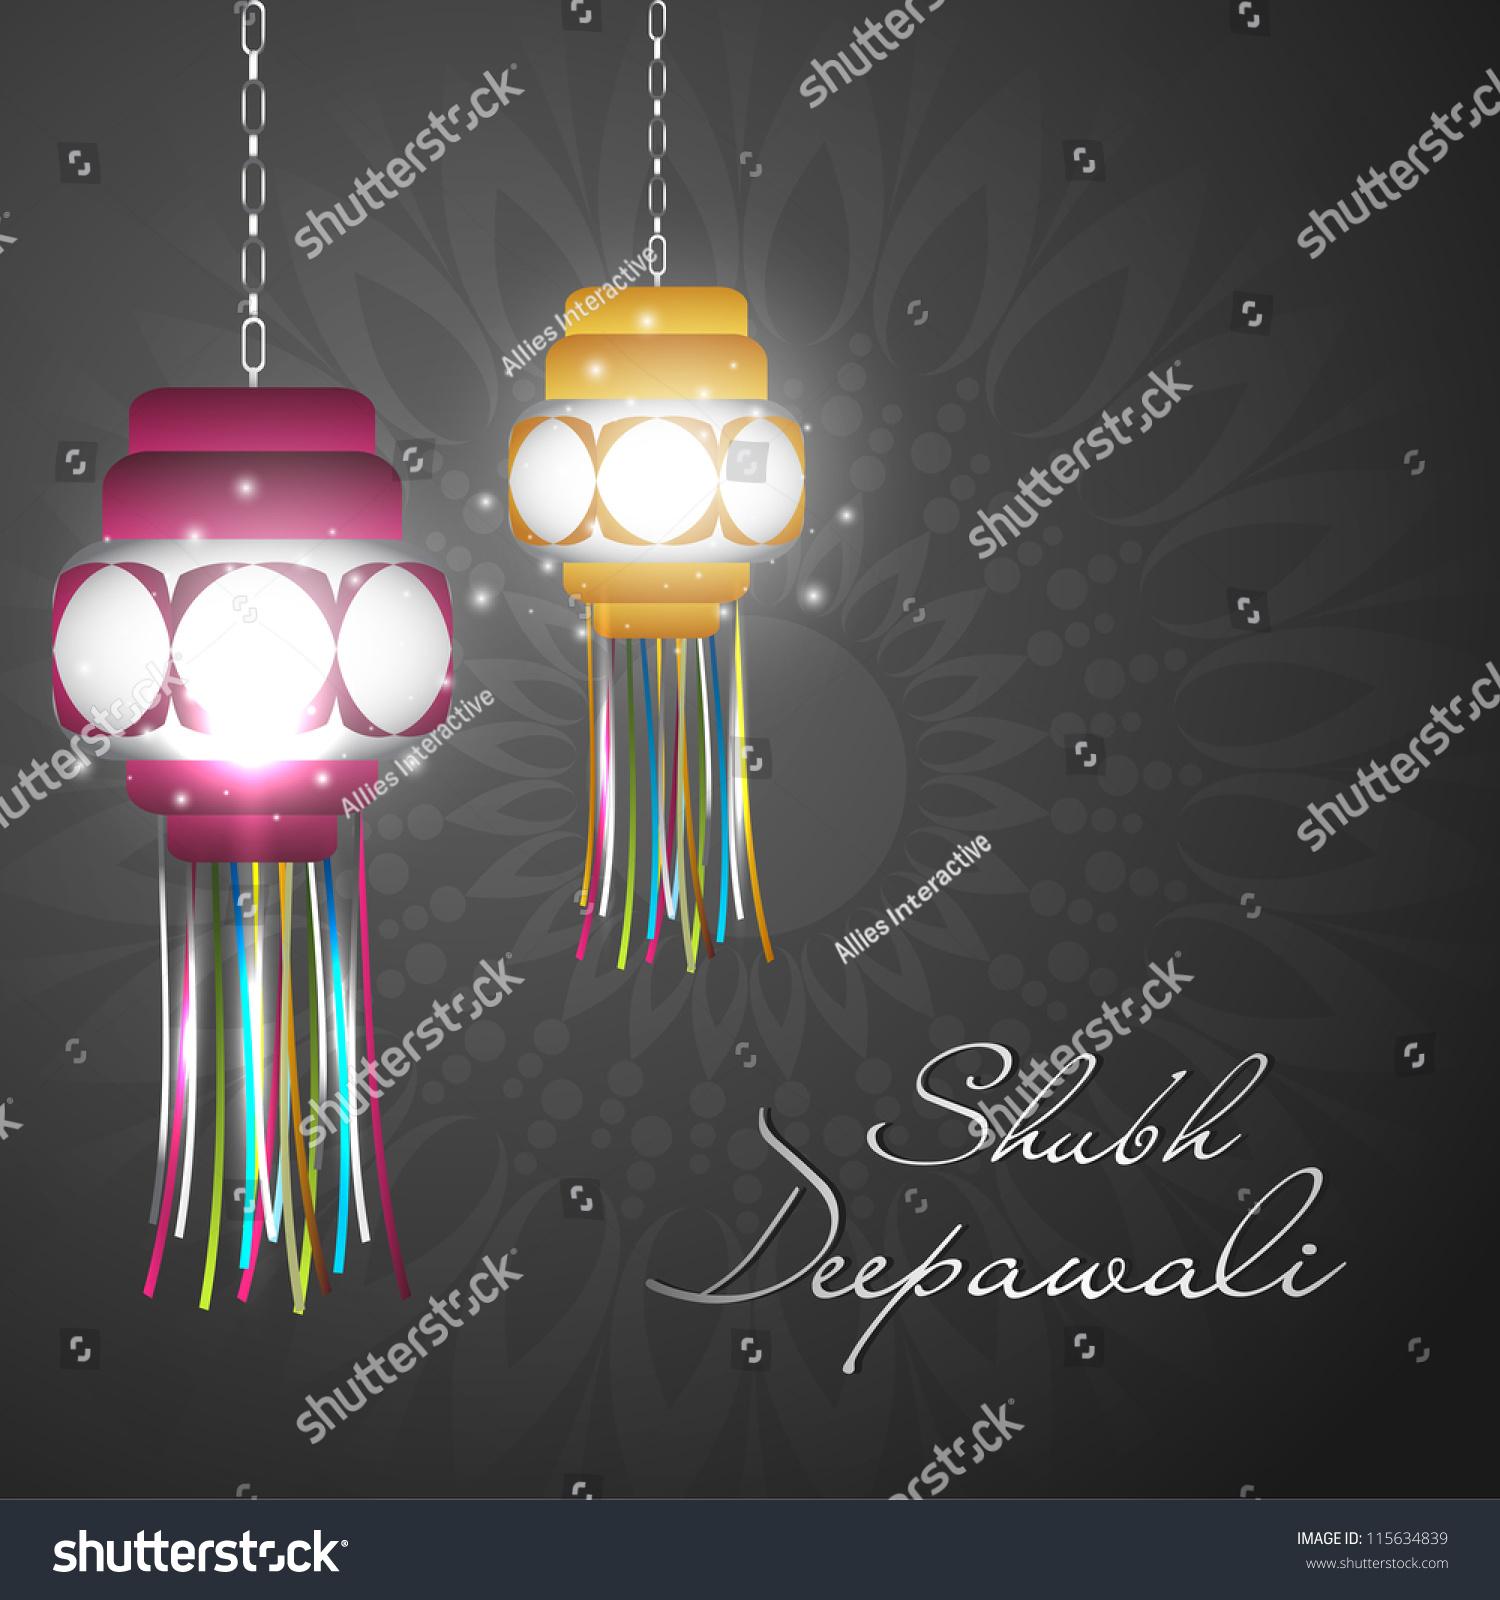 Hanging Lamp For Diwali Festival In India. Eps 10. Stock